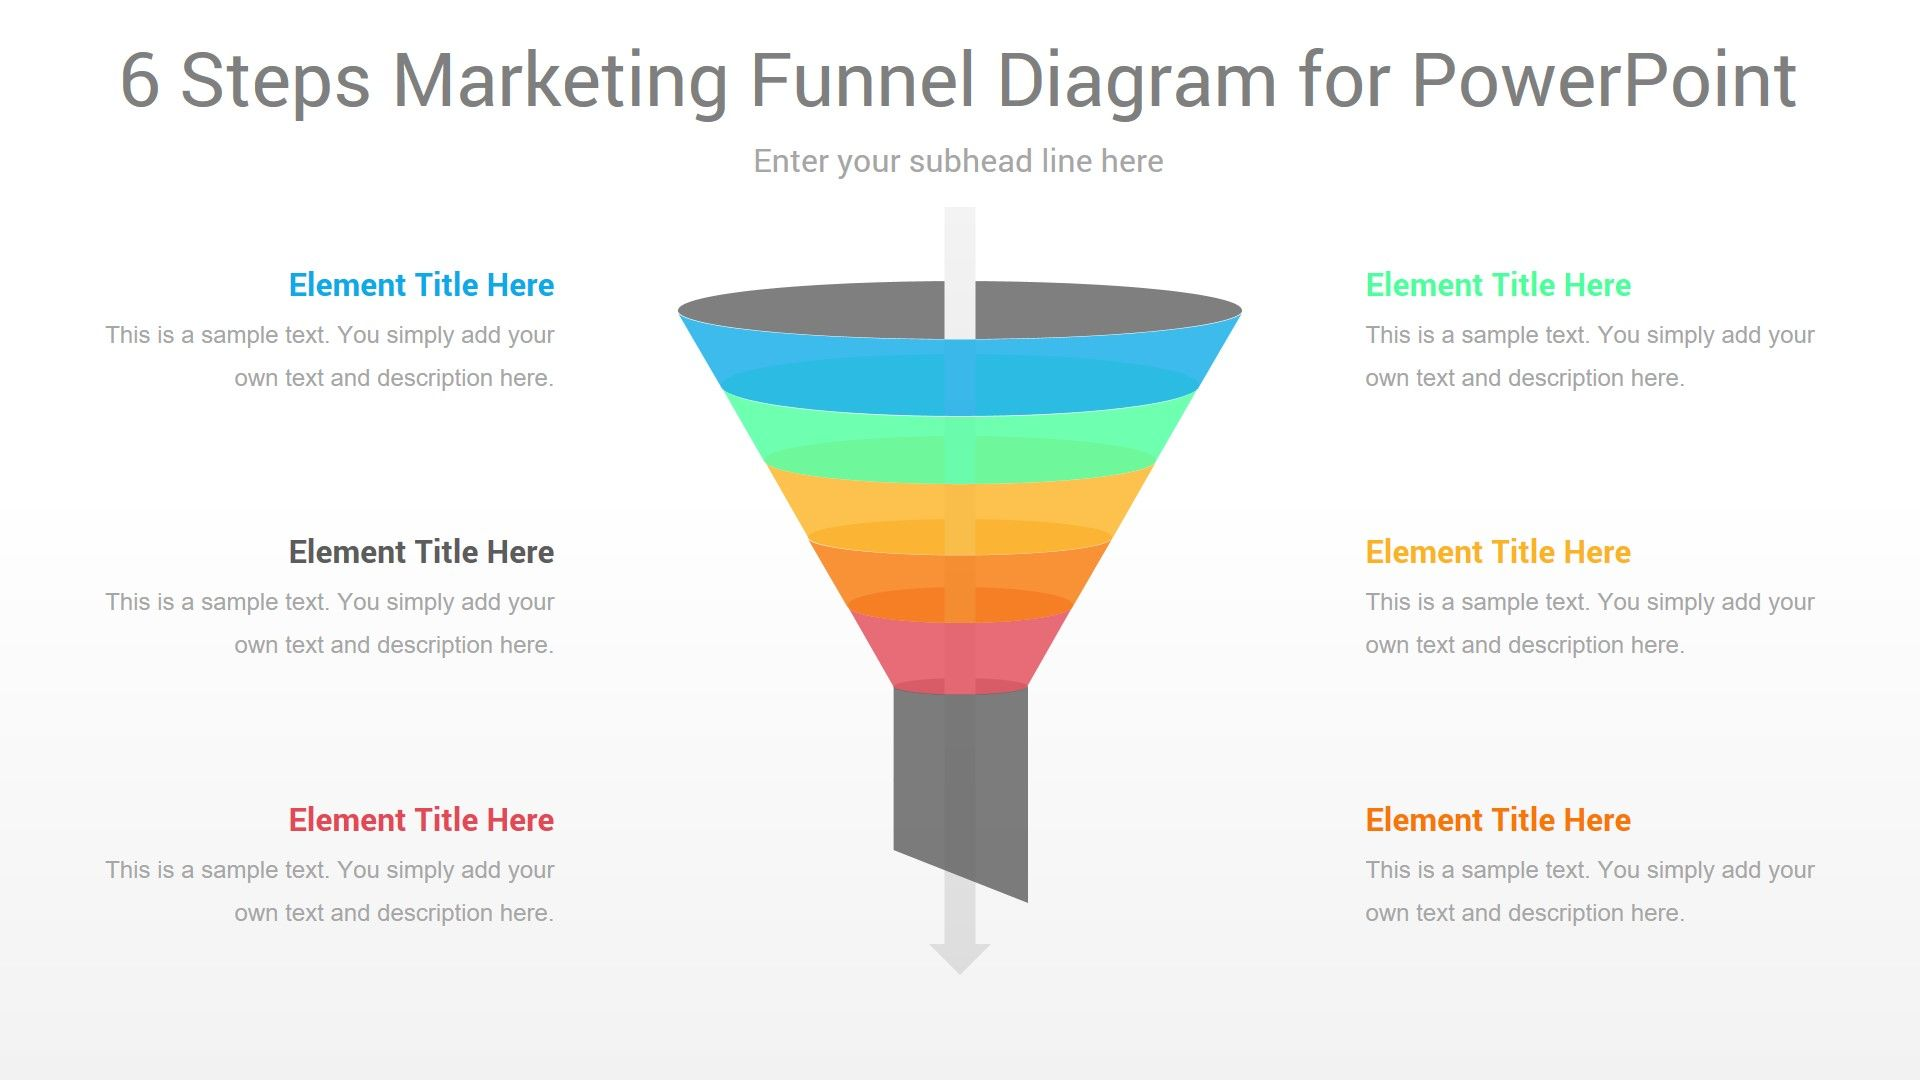 6 Steps Marketing Funnel Powerpoint Diagram In 2020 Infographic Powerpoint Marketing Funnel